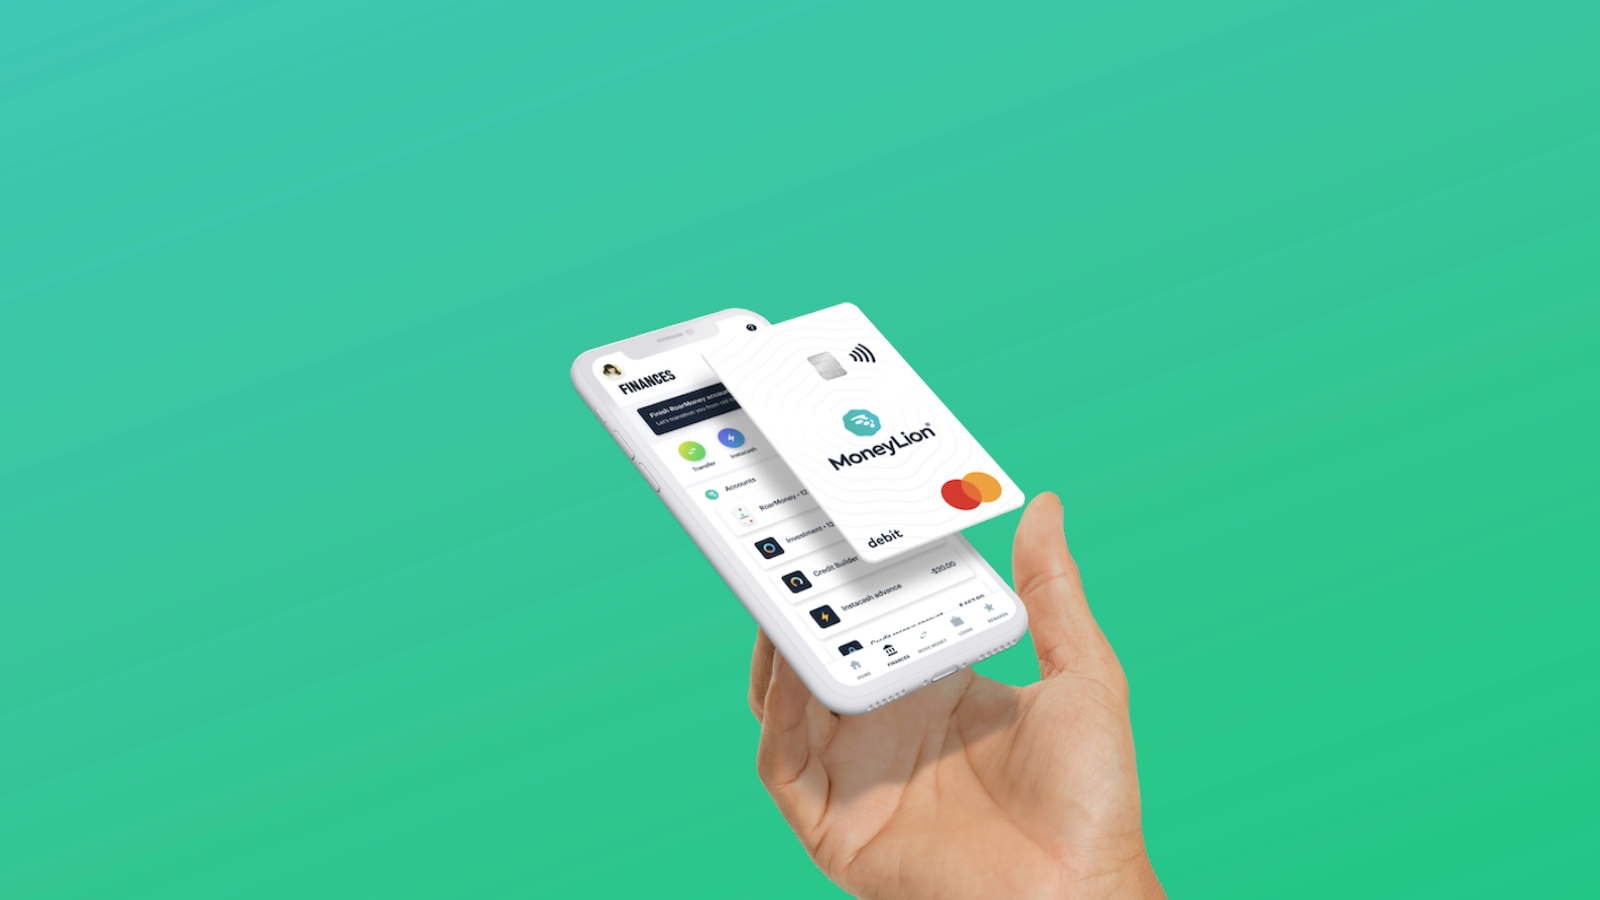 MoneyLion locks customer accounts after credential stuffing attacks